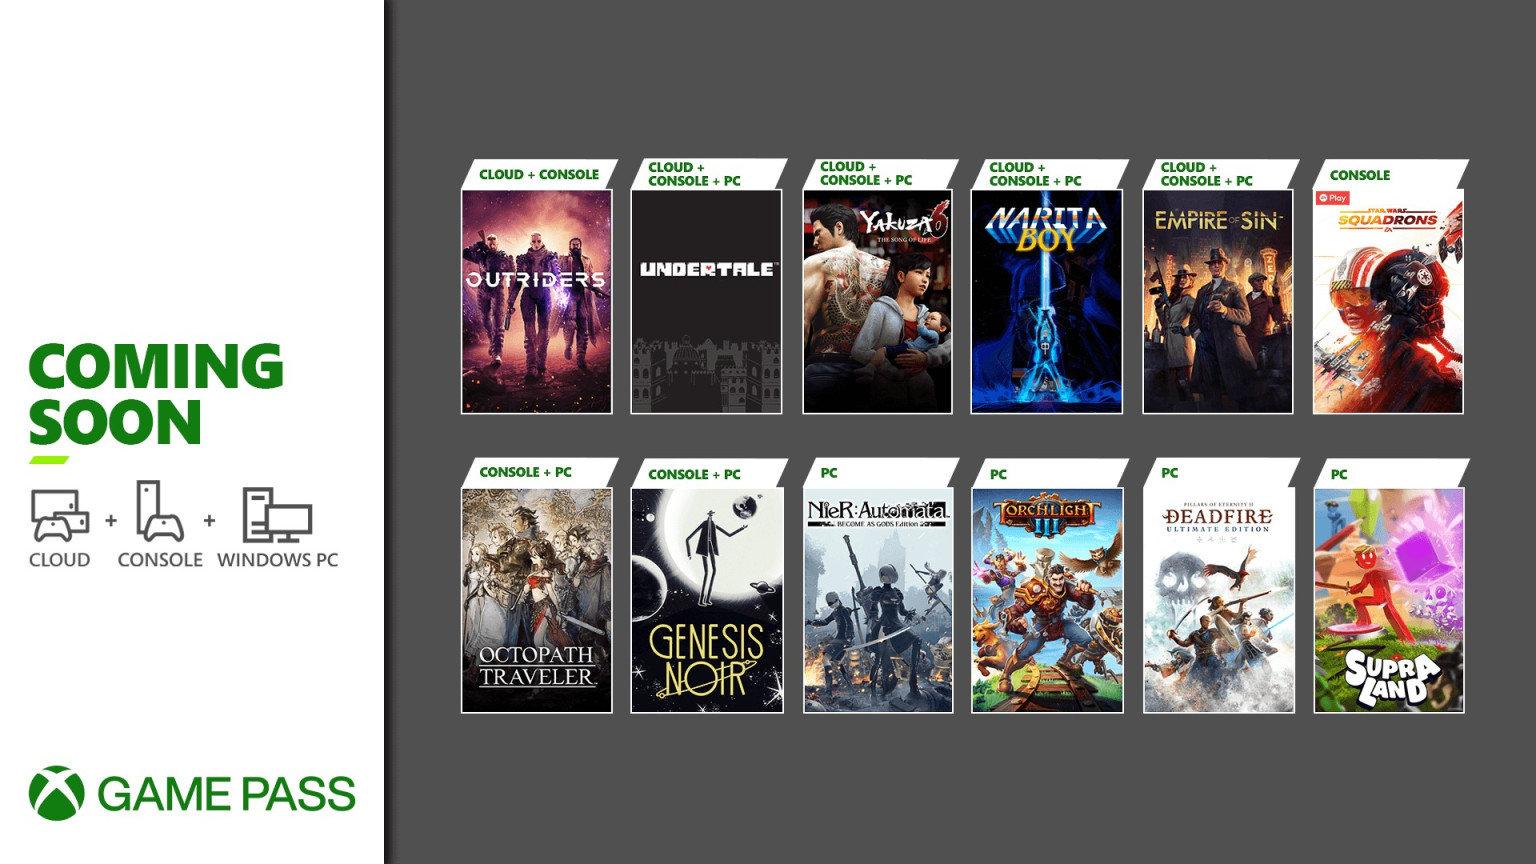 XGP 3月下旬新增游戏阵容 《尼尔》《火炬之光3》《八方旅人》等